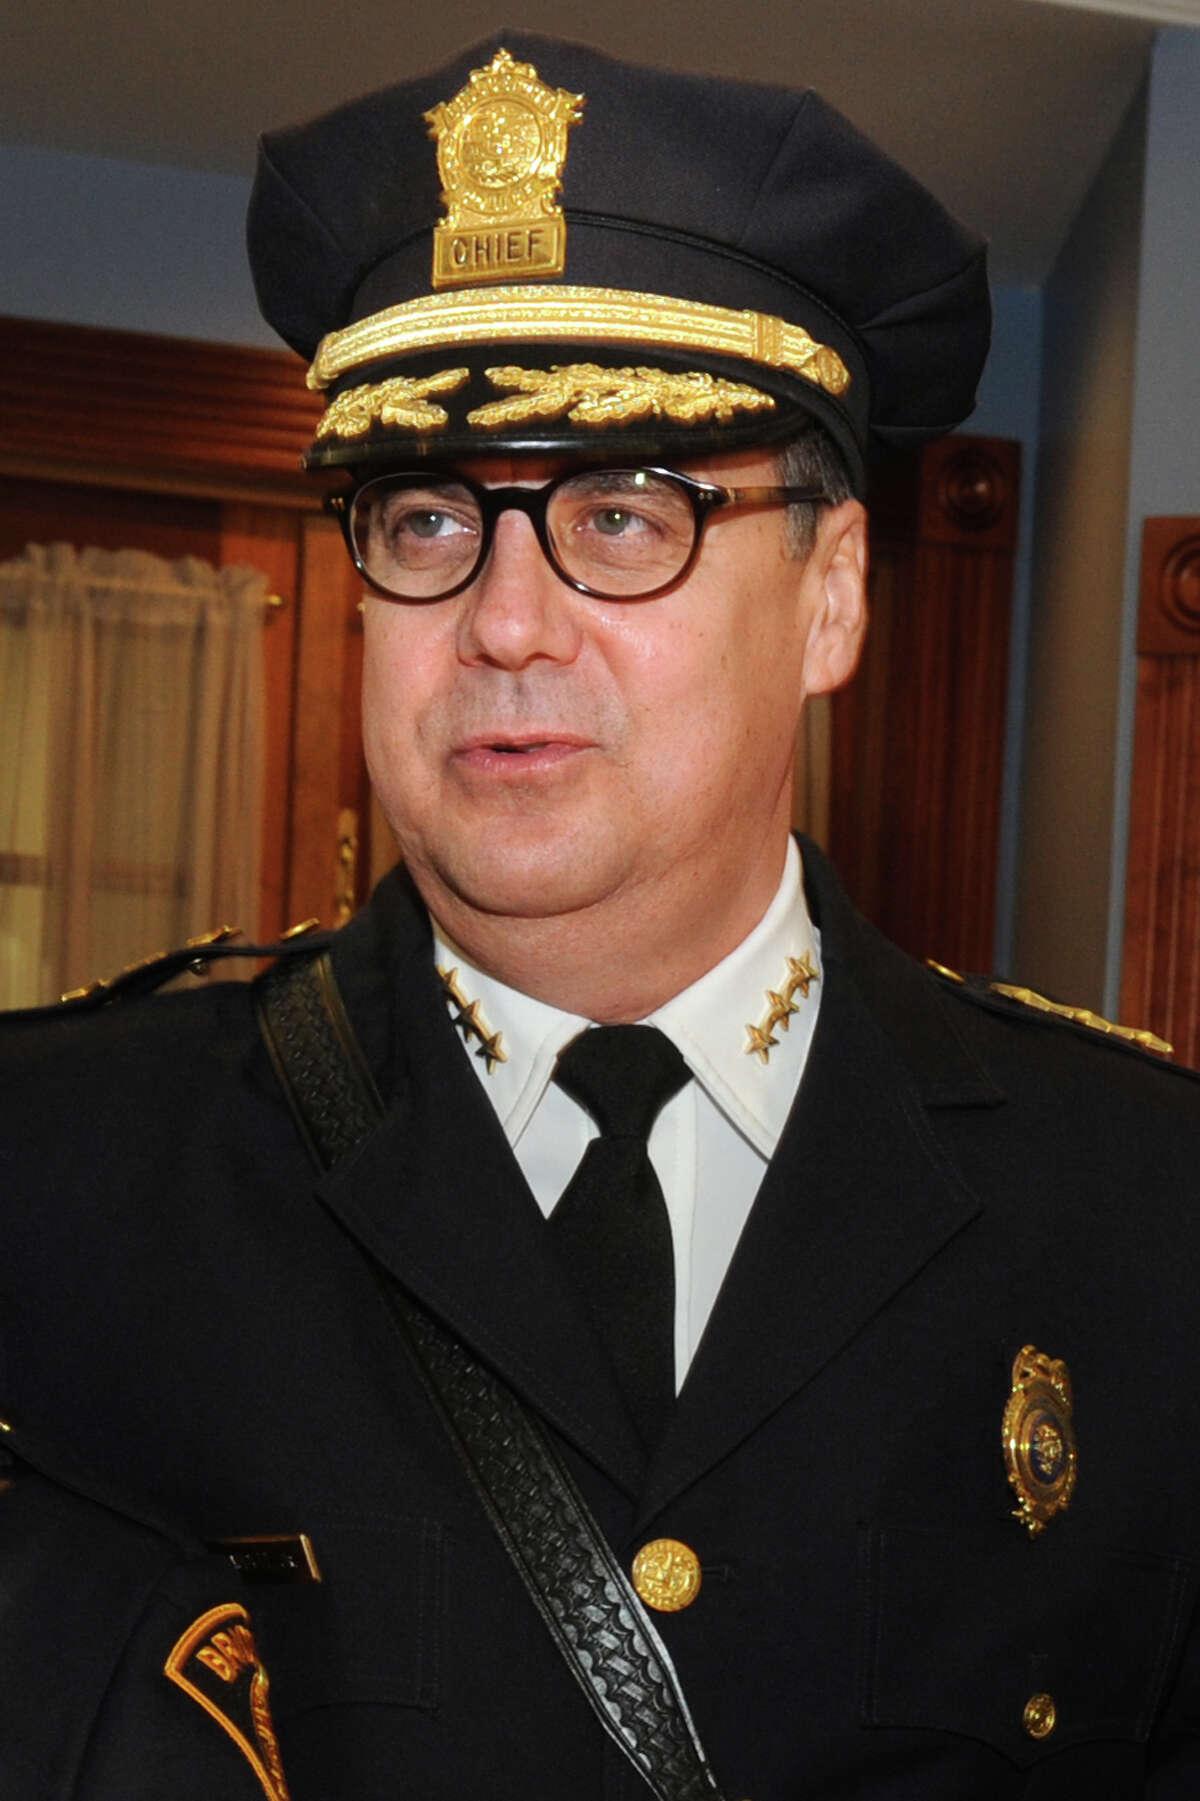 Bridgeport Police Chief Joseph Gaudett is a resident of Newtown.